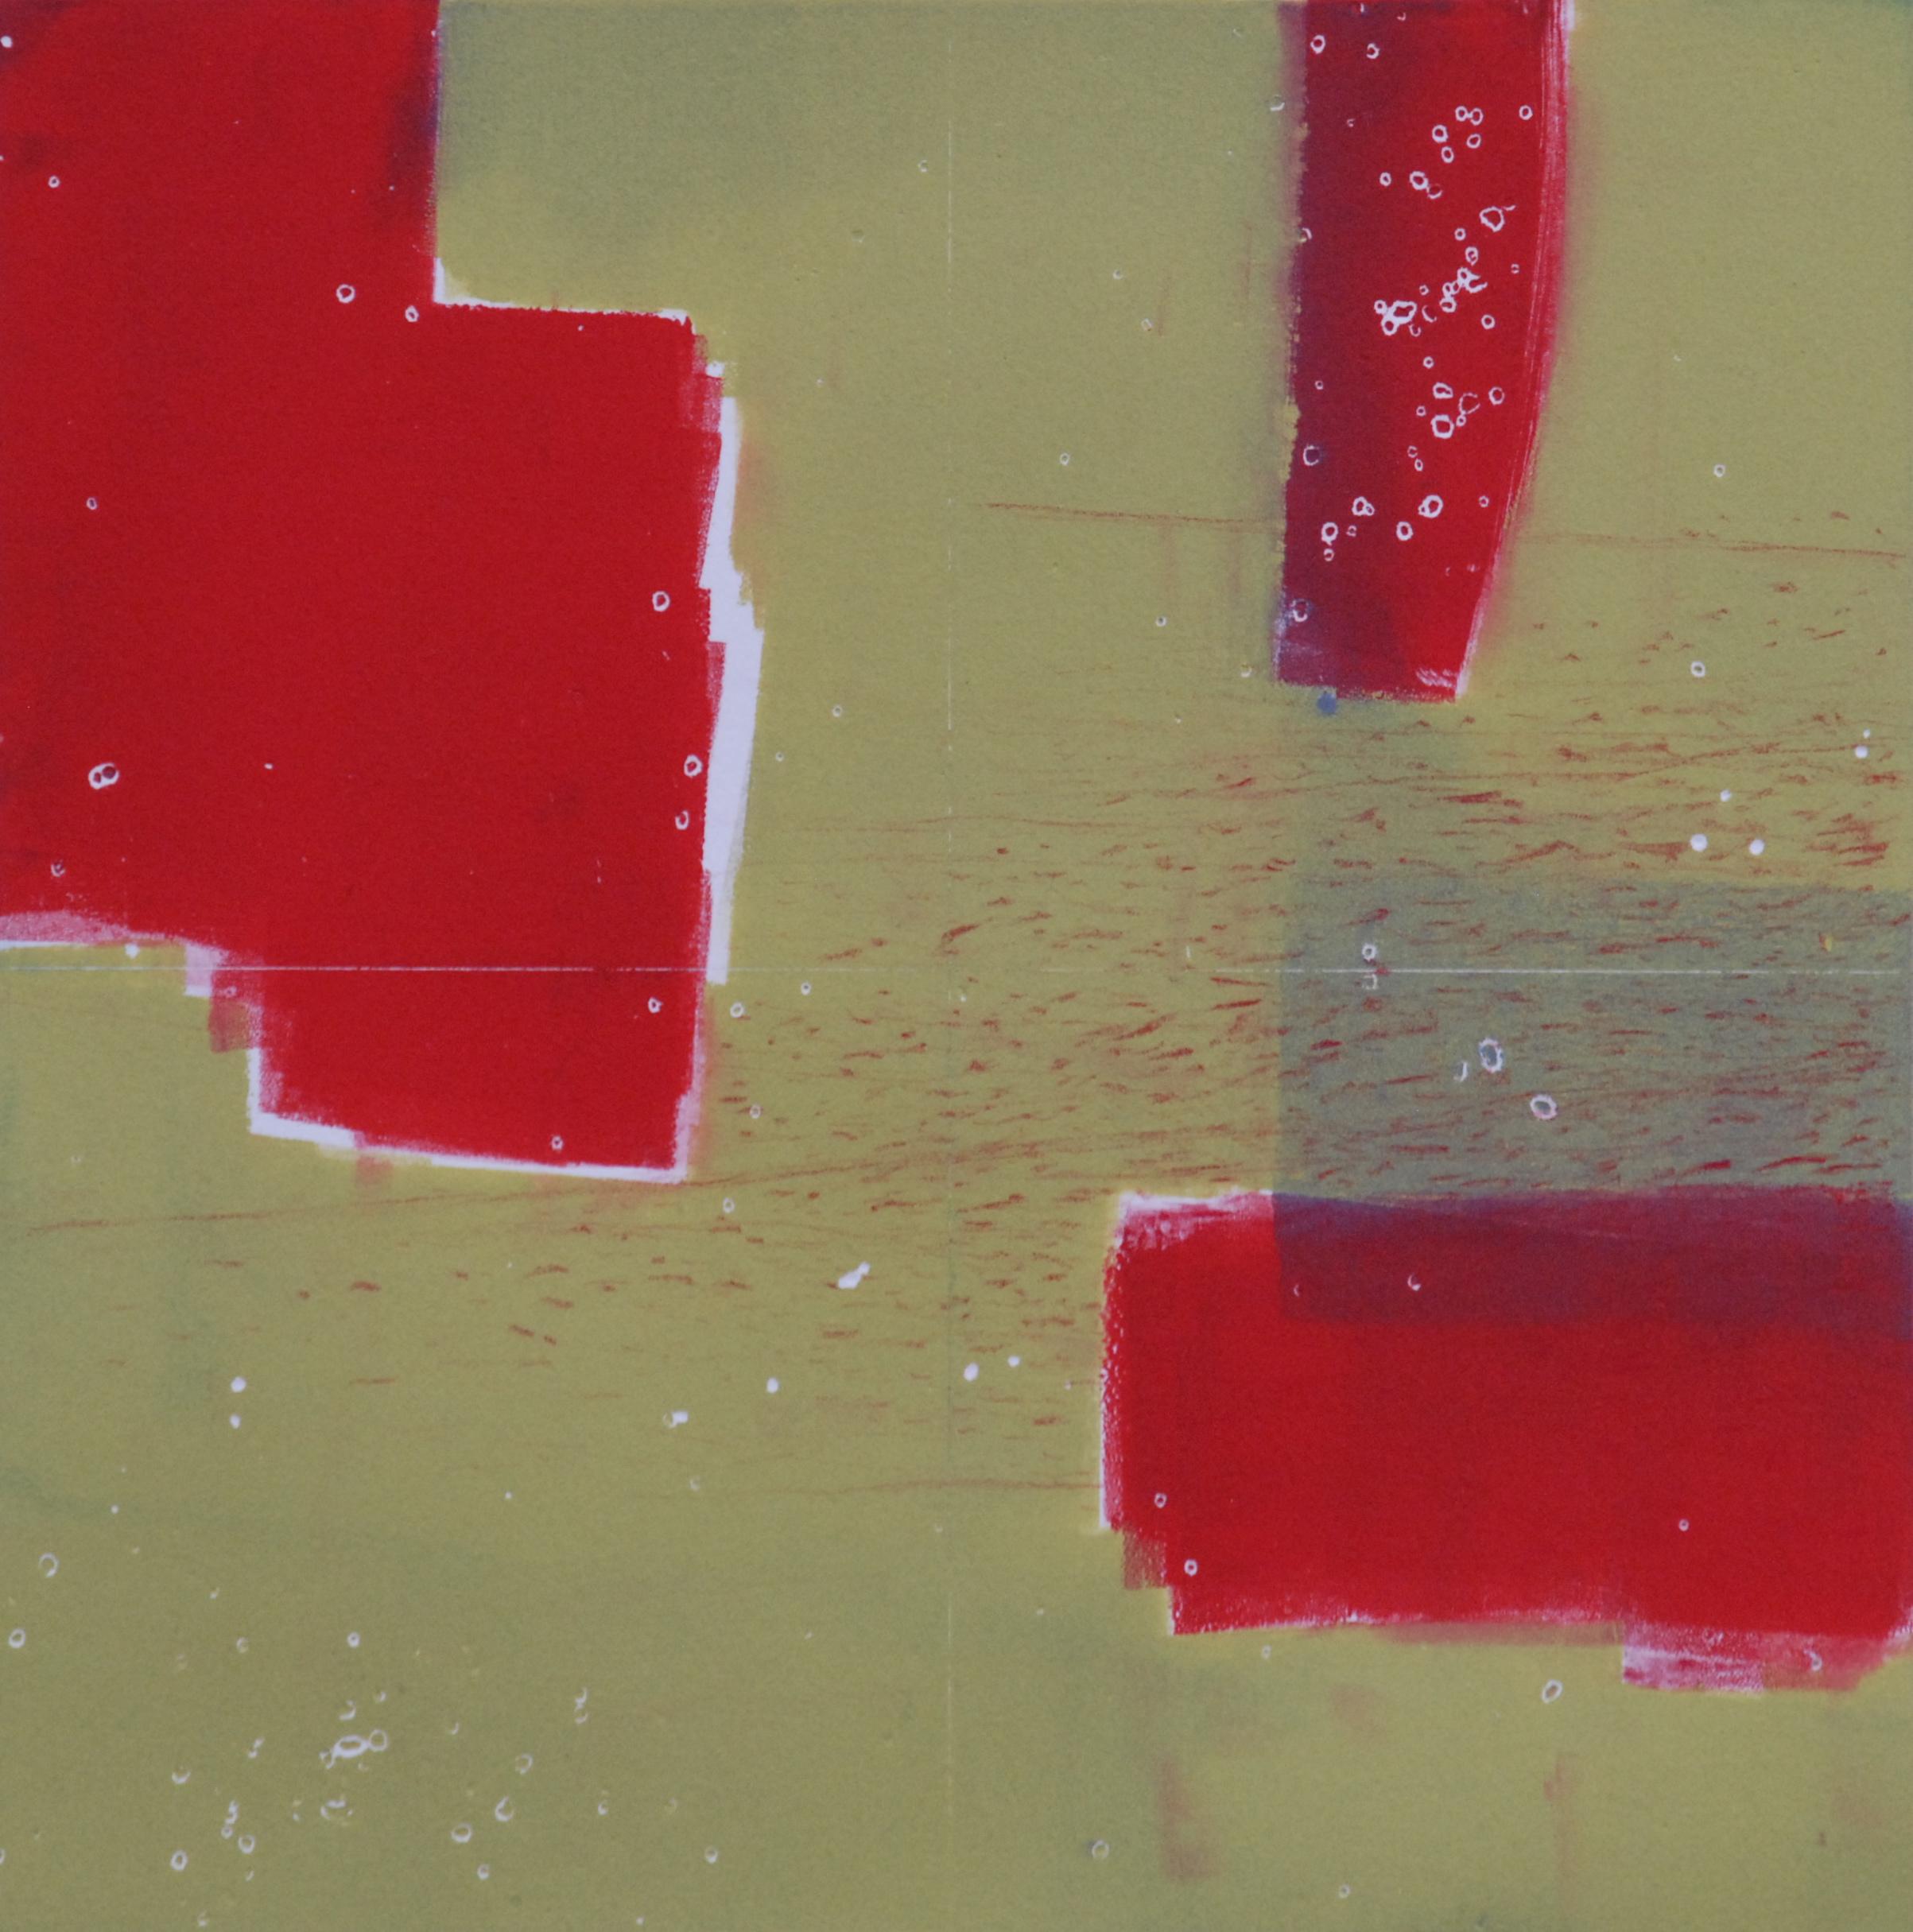 "Sodium Deviation 38, 2016  monoprint  10"" x 10"" image on 11"" x 14"" paper"